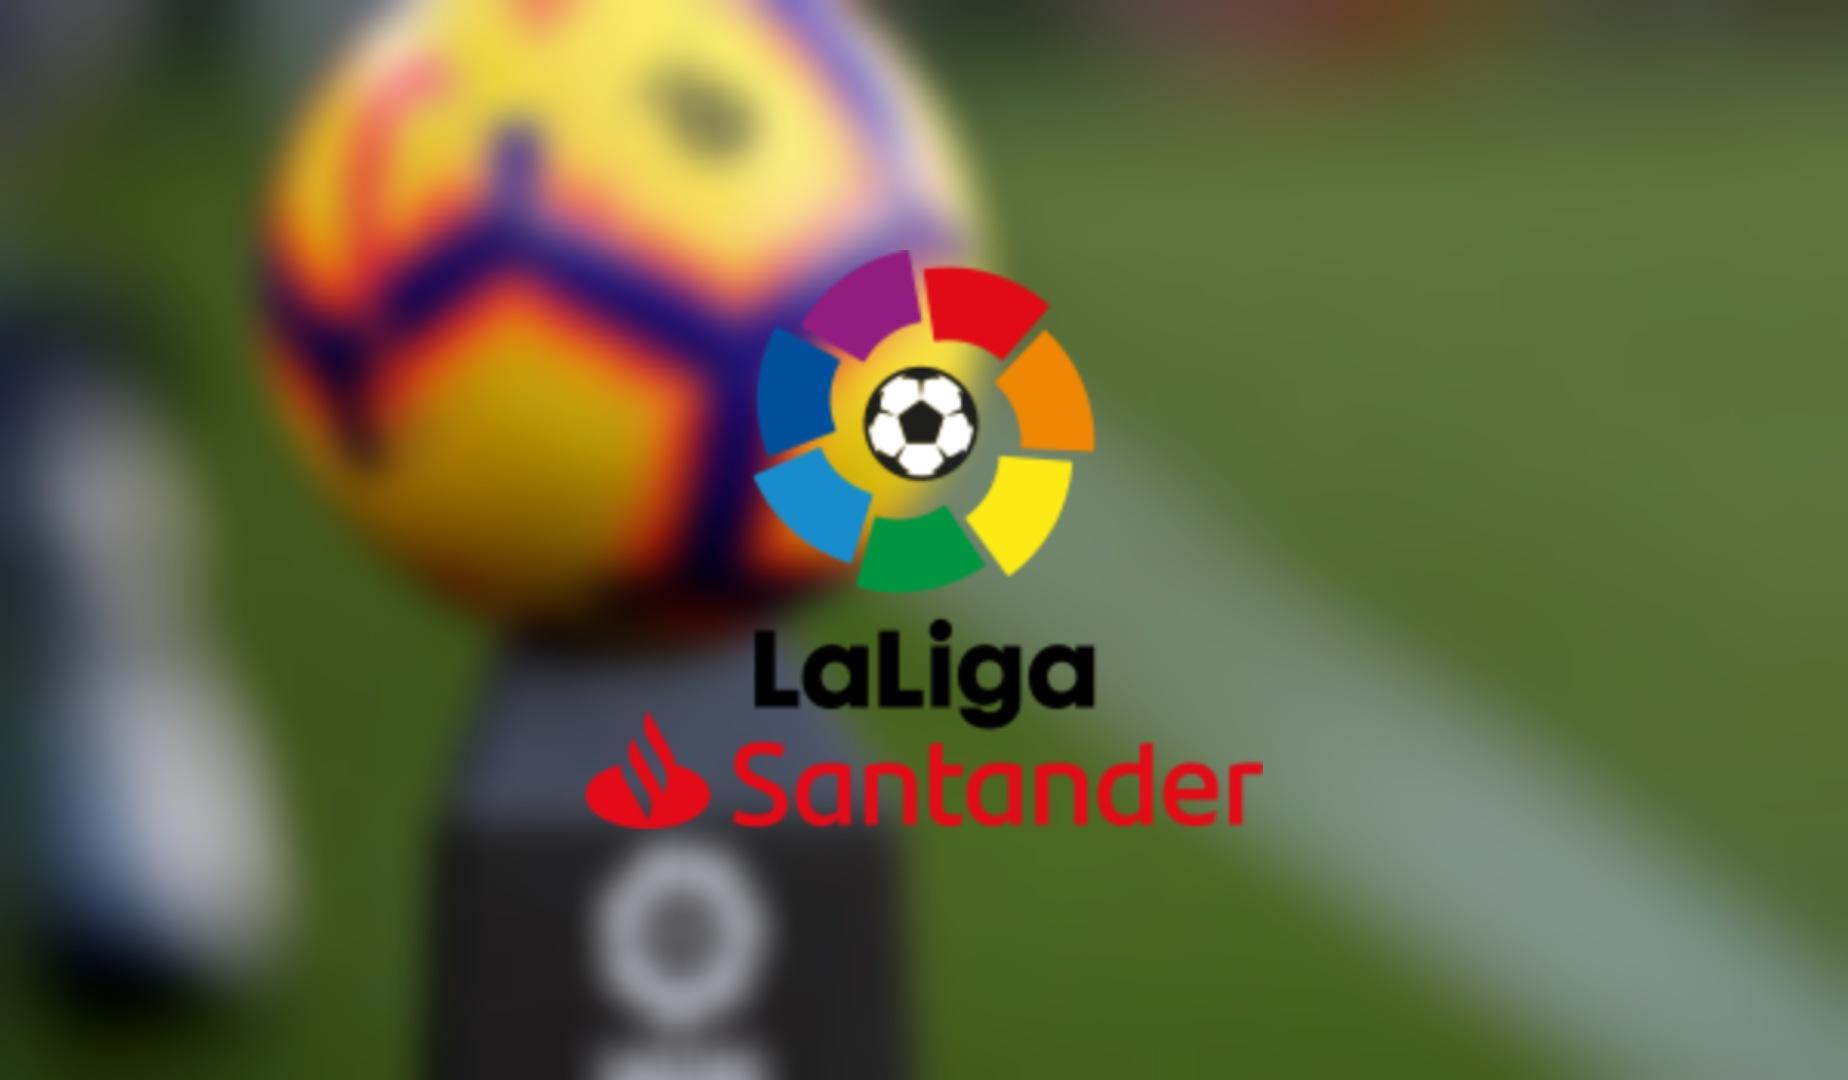 Jadual La Liga Sepanyol 2021/2022 Waktu Malaysia (Keputusan)